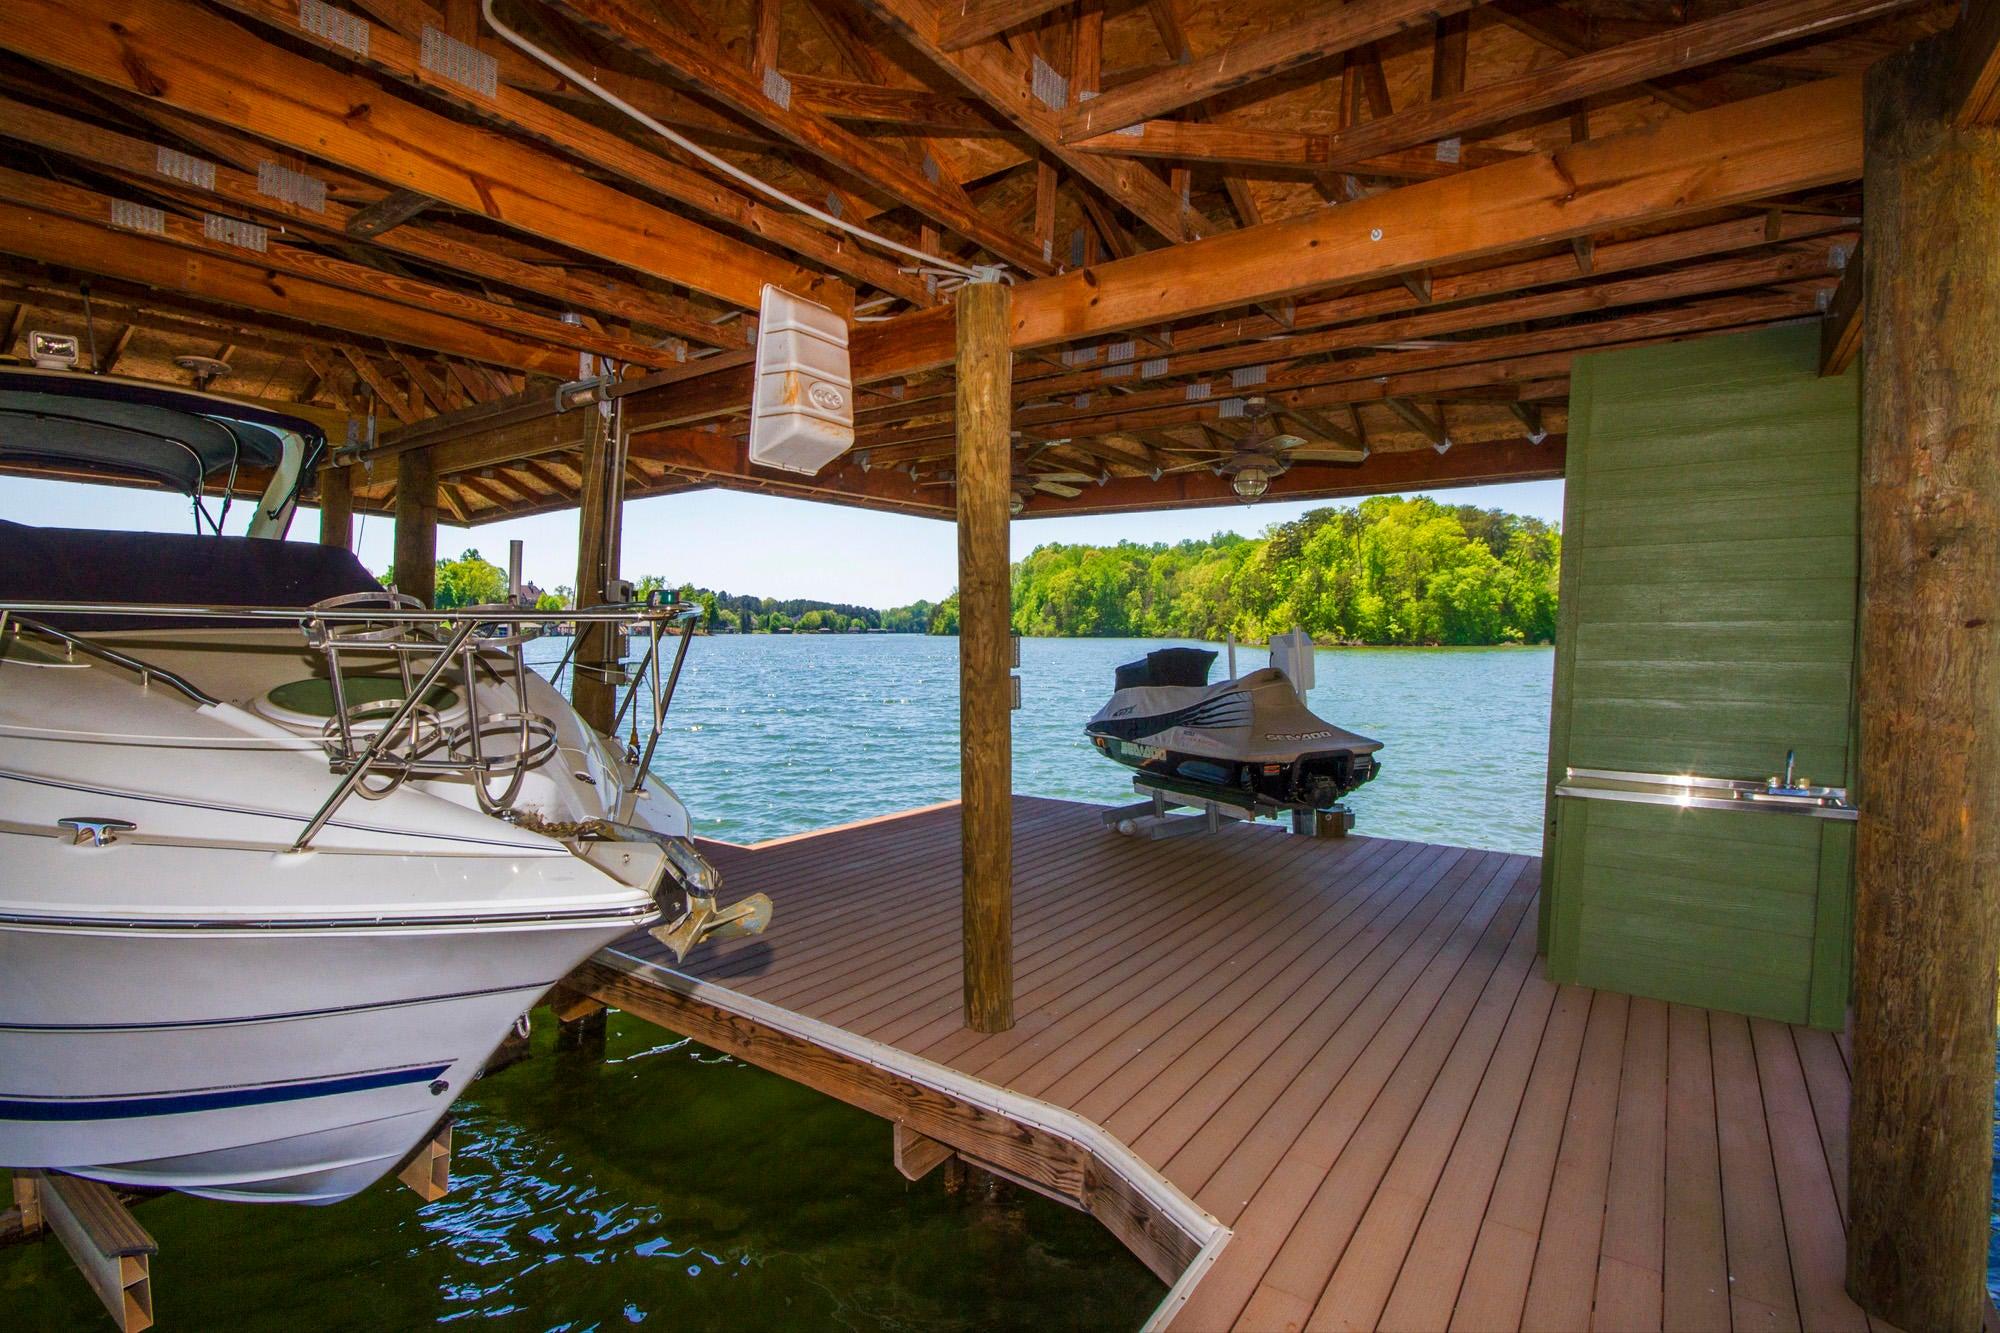 Covered Boat & Jet Ski Lifts!